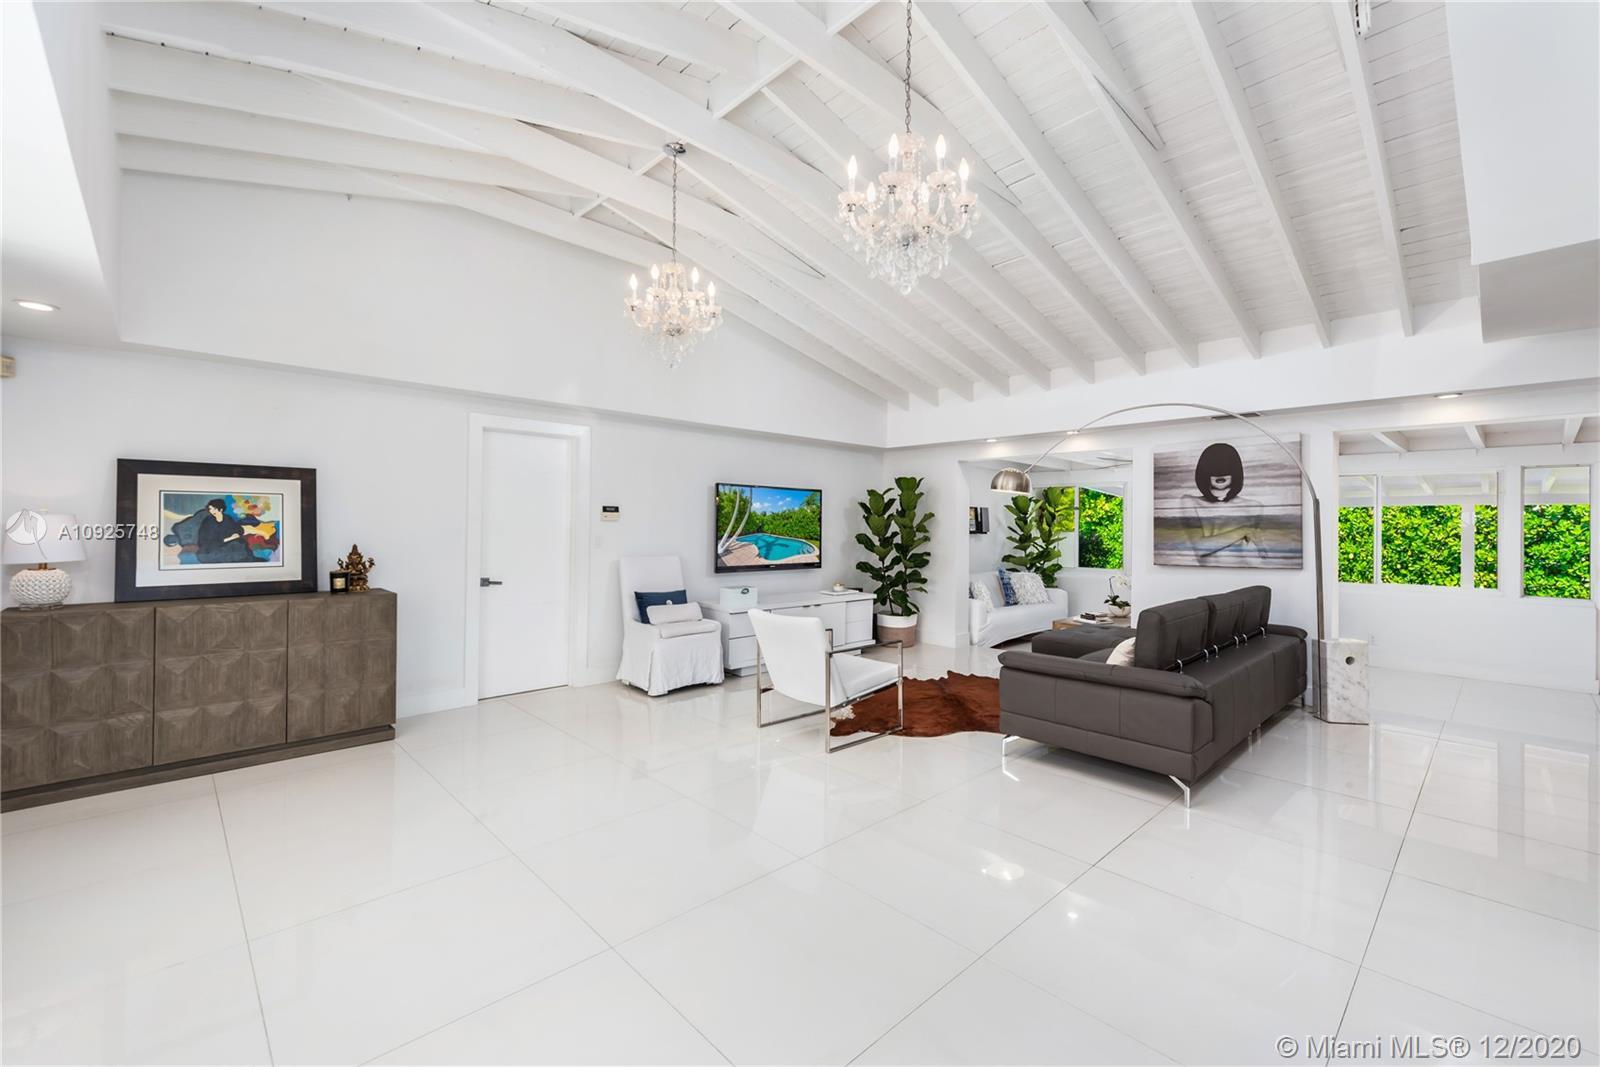 Tropical Isle Homes - 544 Allendale Rd, Key Biscayne, FL 33149